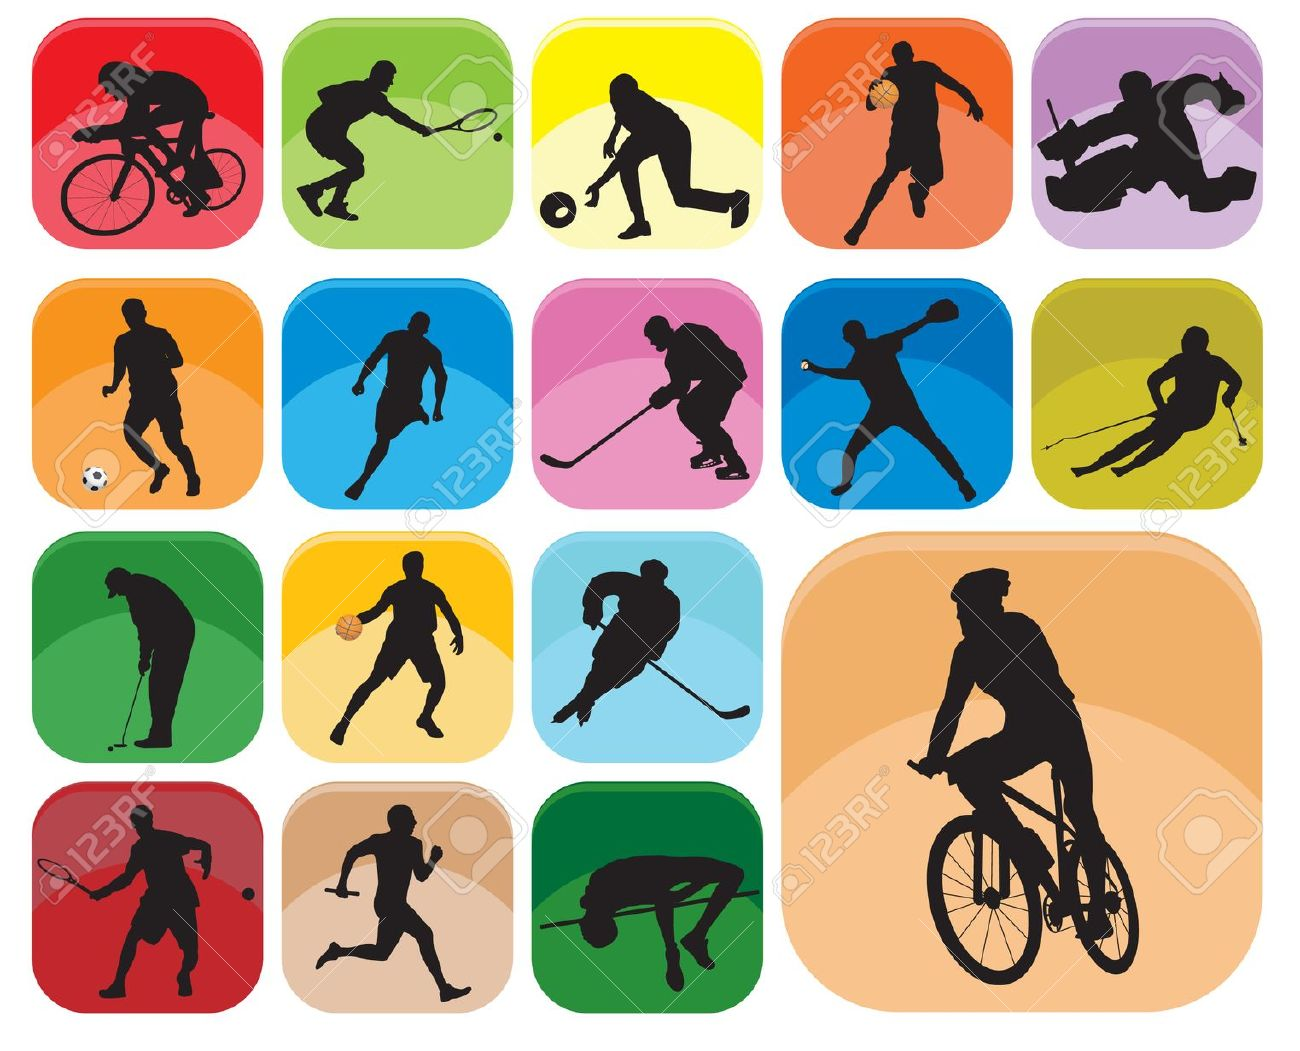 Sport event clipart clipground for Immagini vector